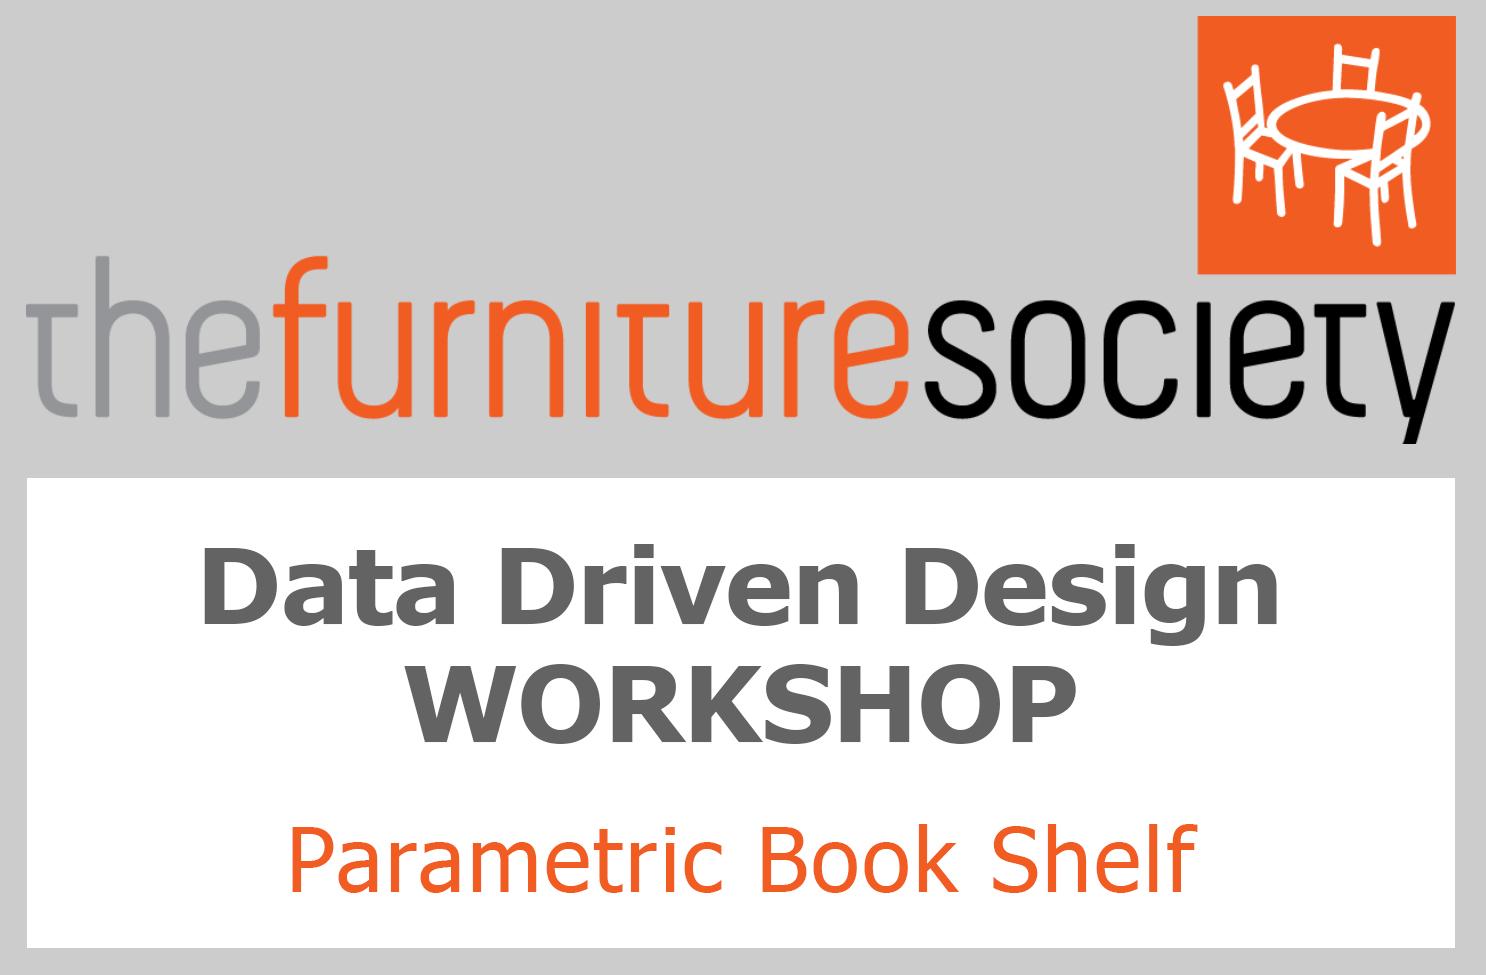 Perfect Furniture Society 2016   Parametric Book Shelf Workshop